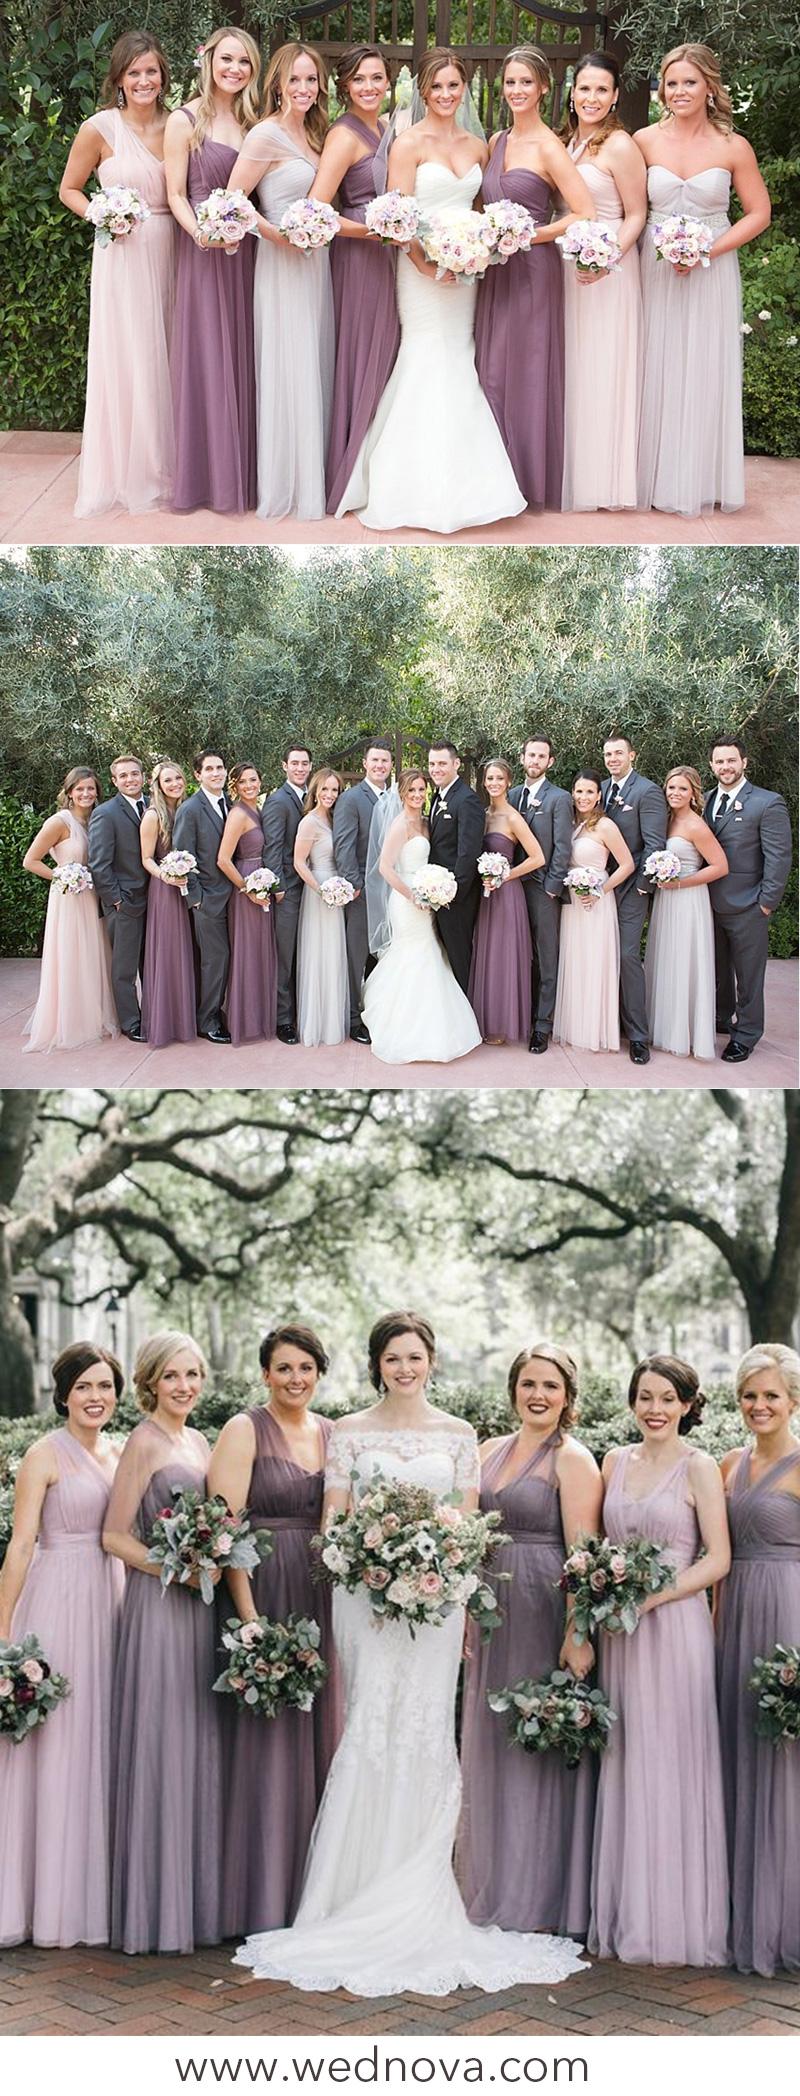 Mauve Color Bridesmaid Dresses | Saddha